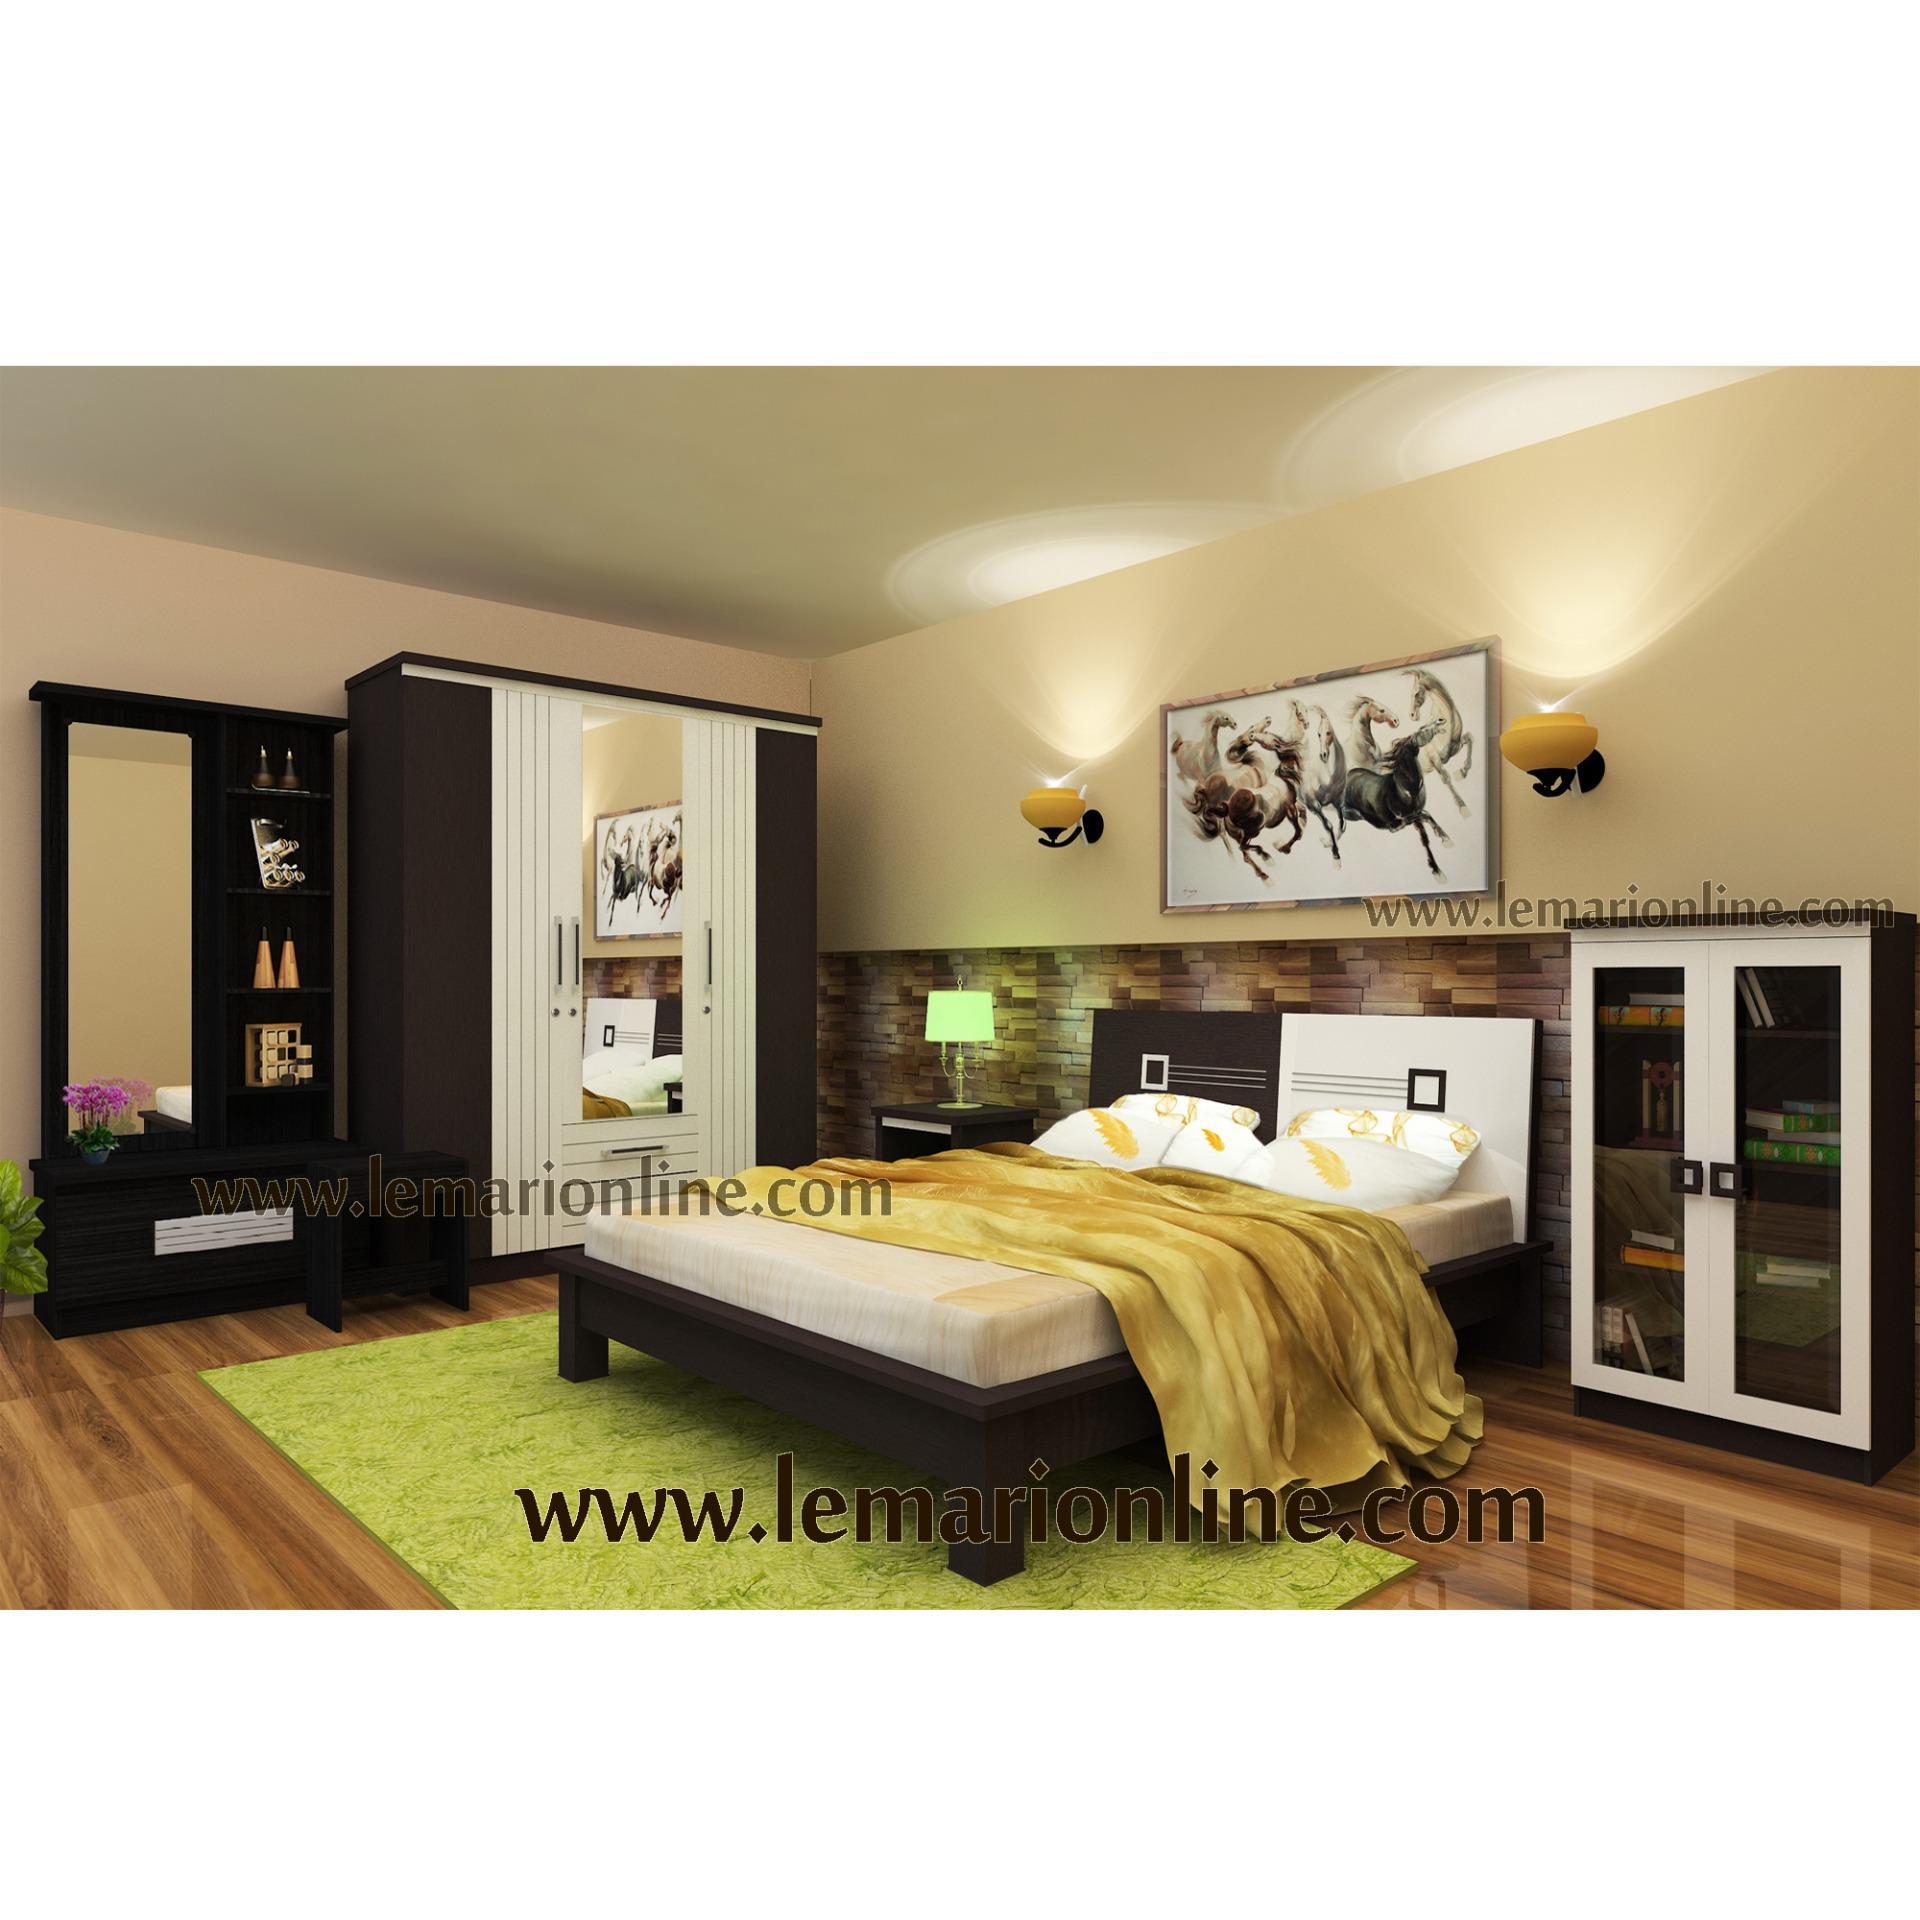 Lemari Pakaian, Meja Rias, Nakas, Ranjang, dan Lemari Buku (Bedroom Set)